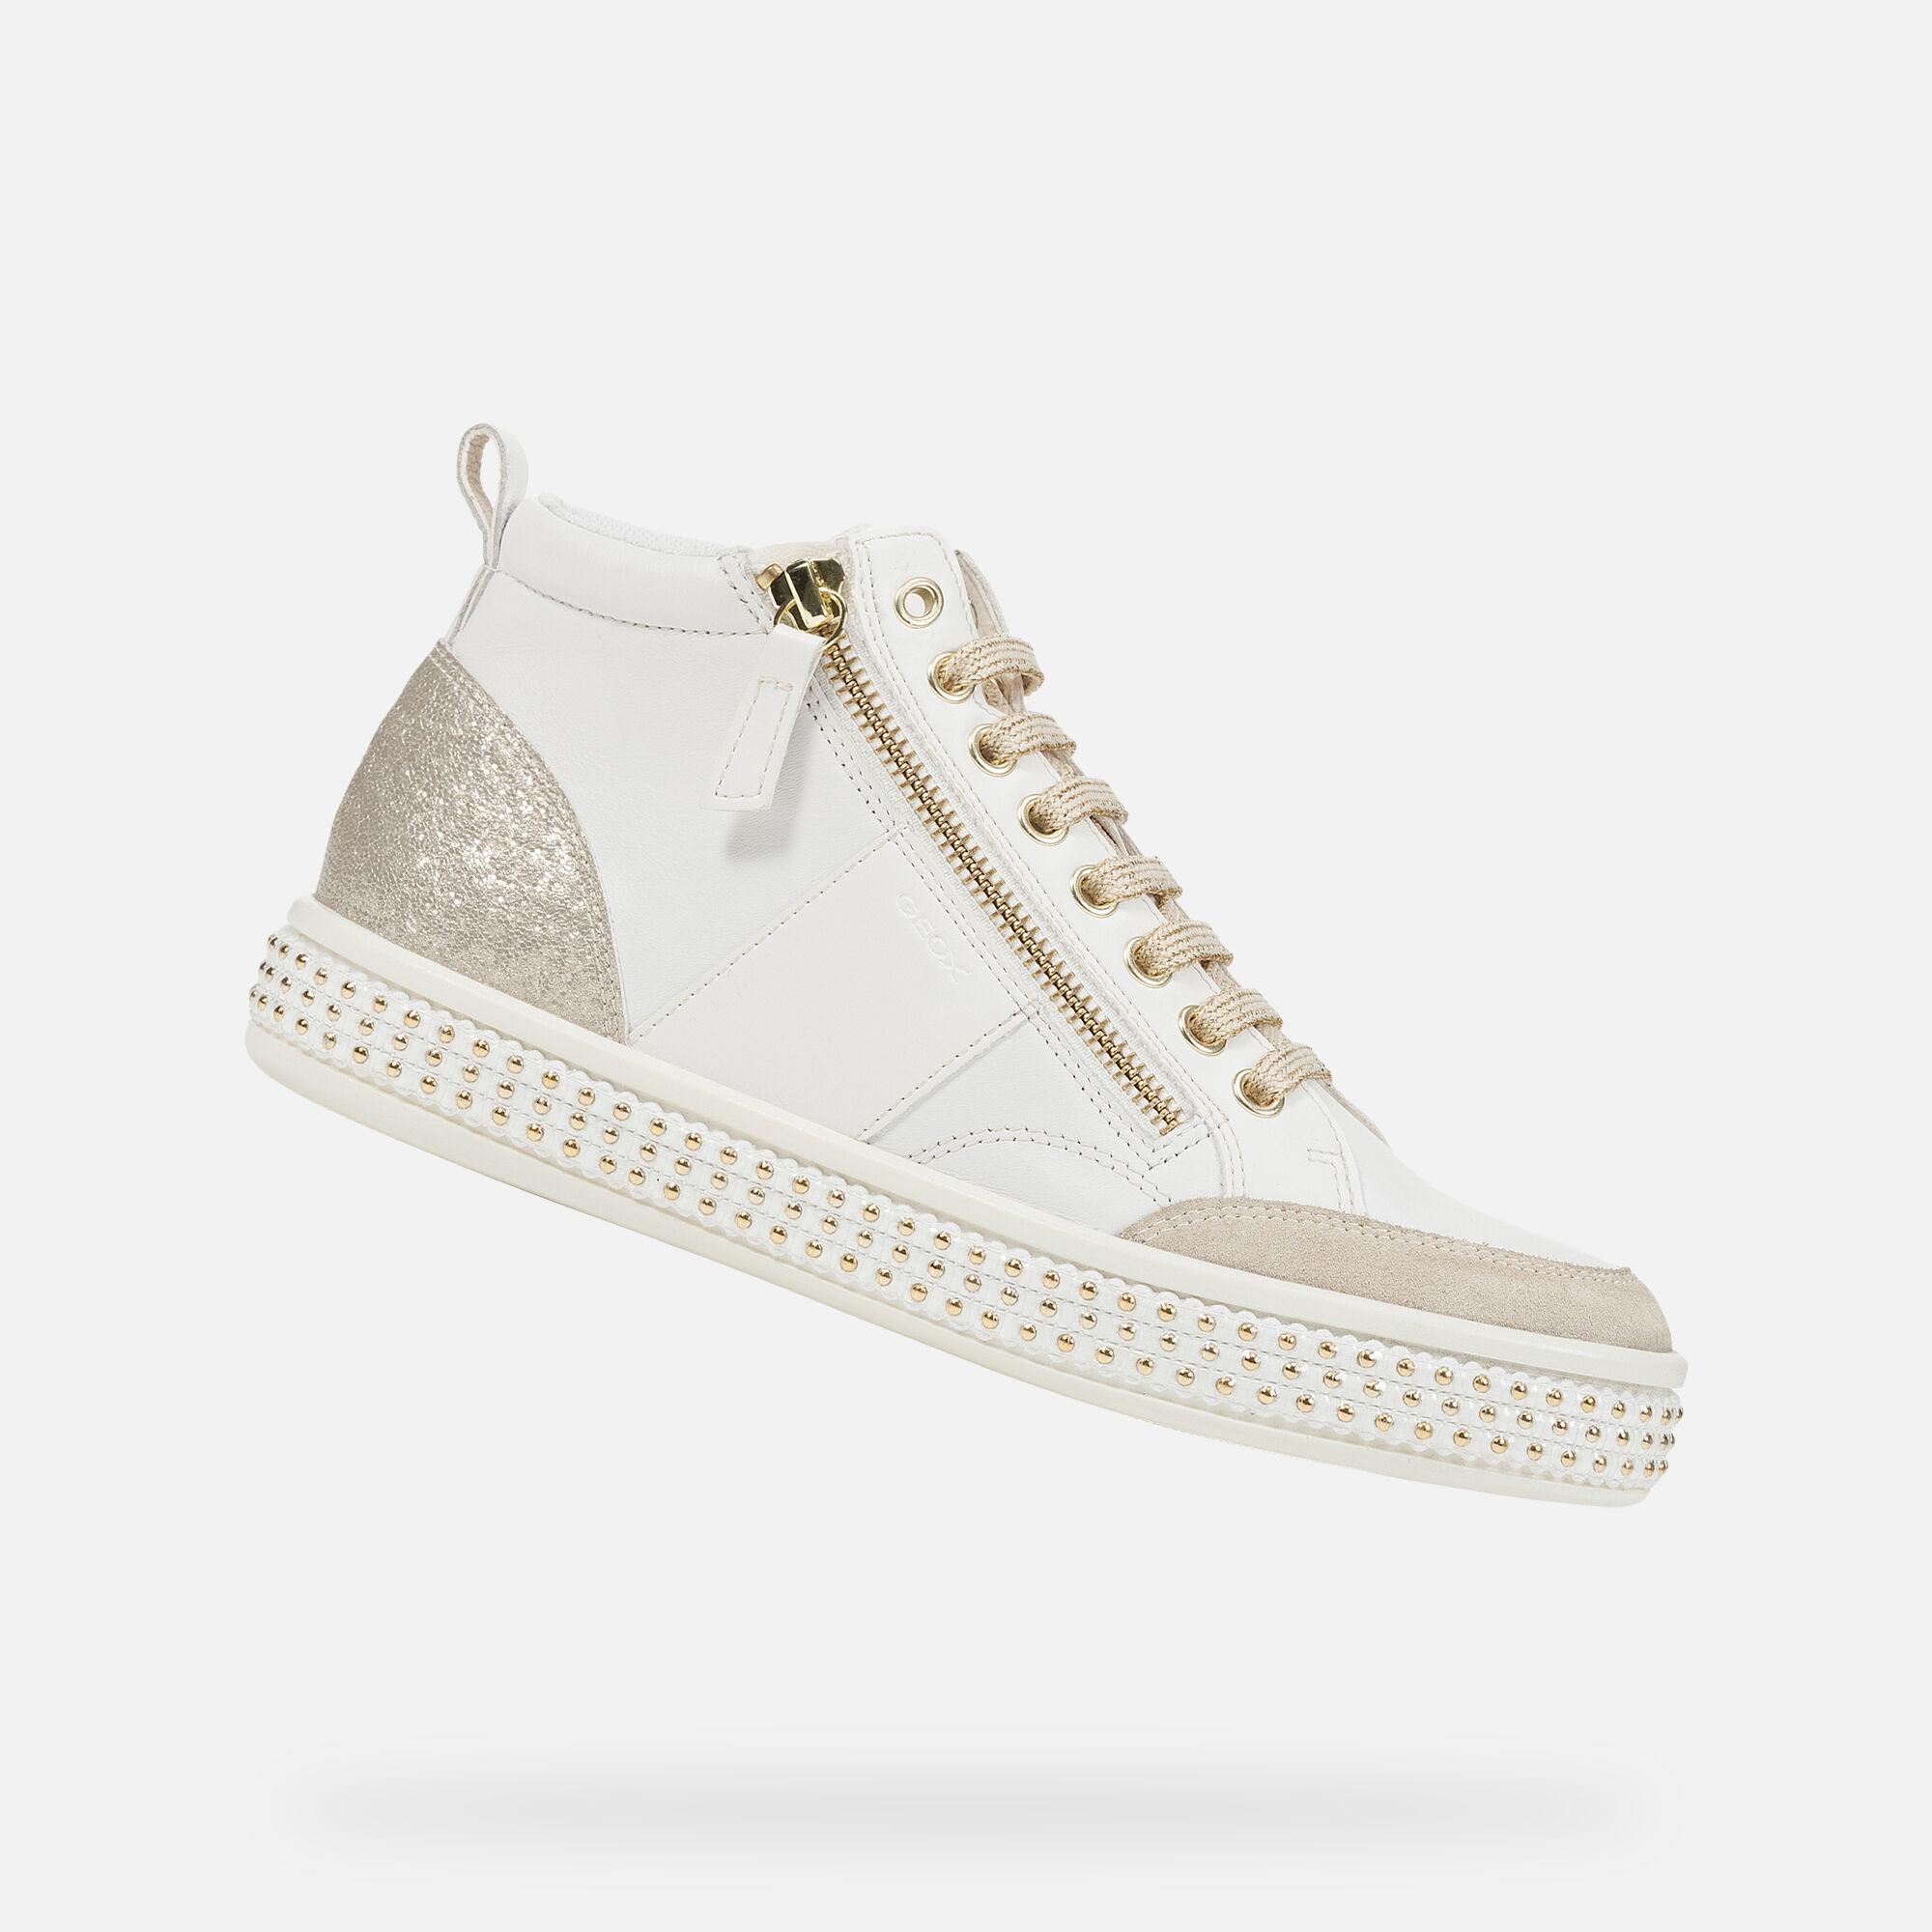 Geox LEELU' Femme Sneakers Blanches | Geox ® Boutique en